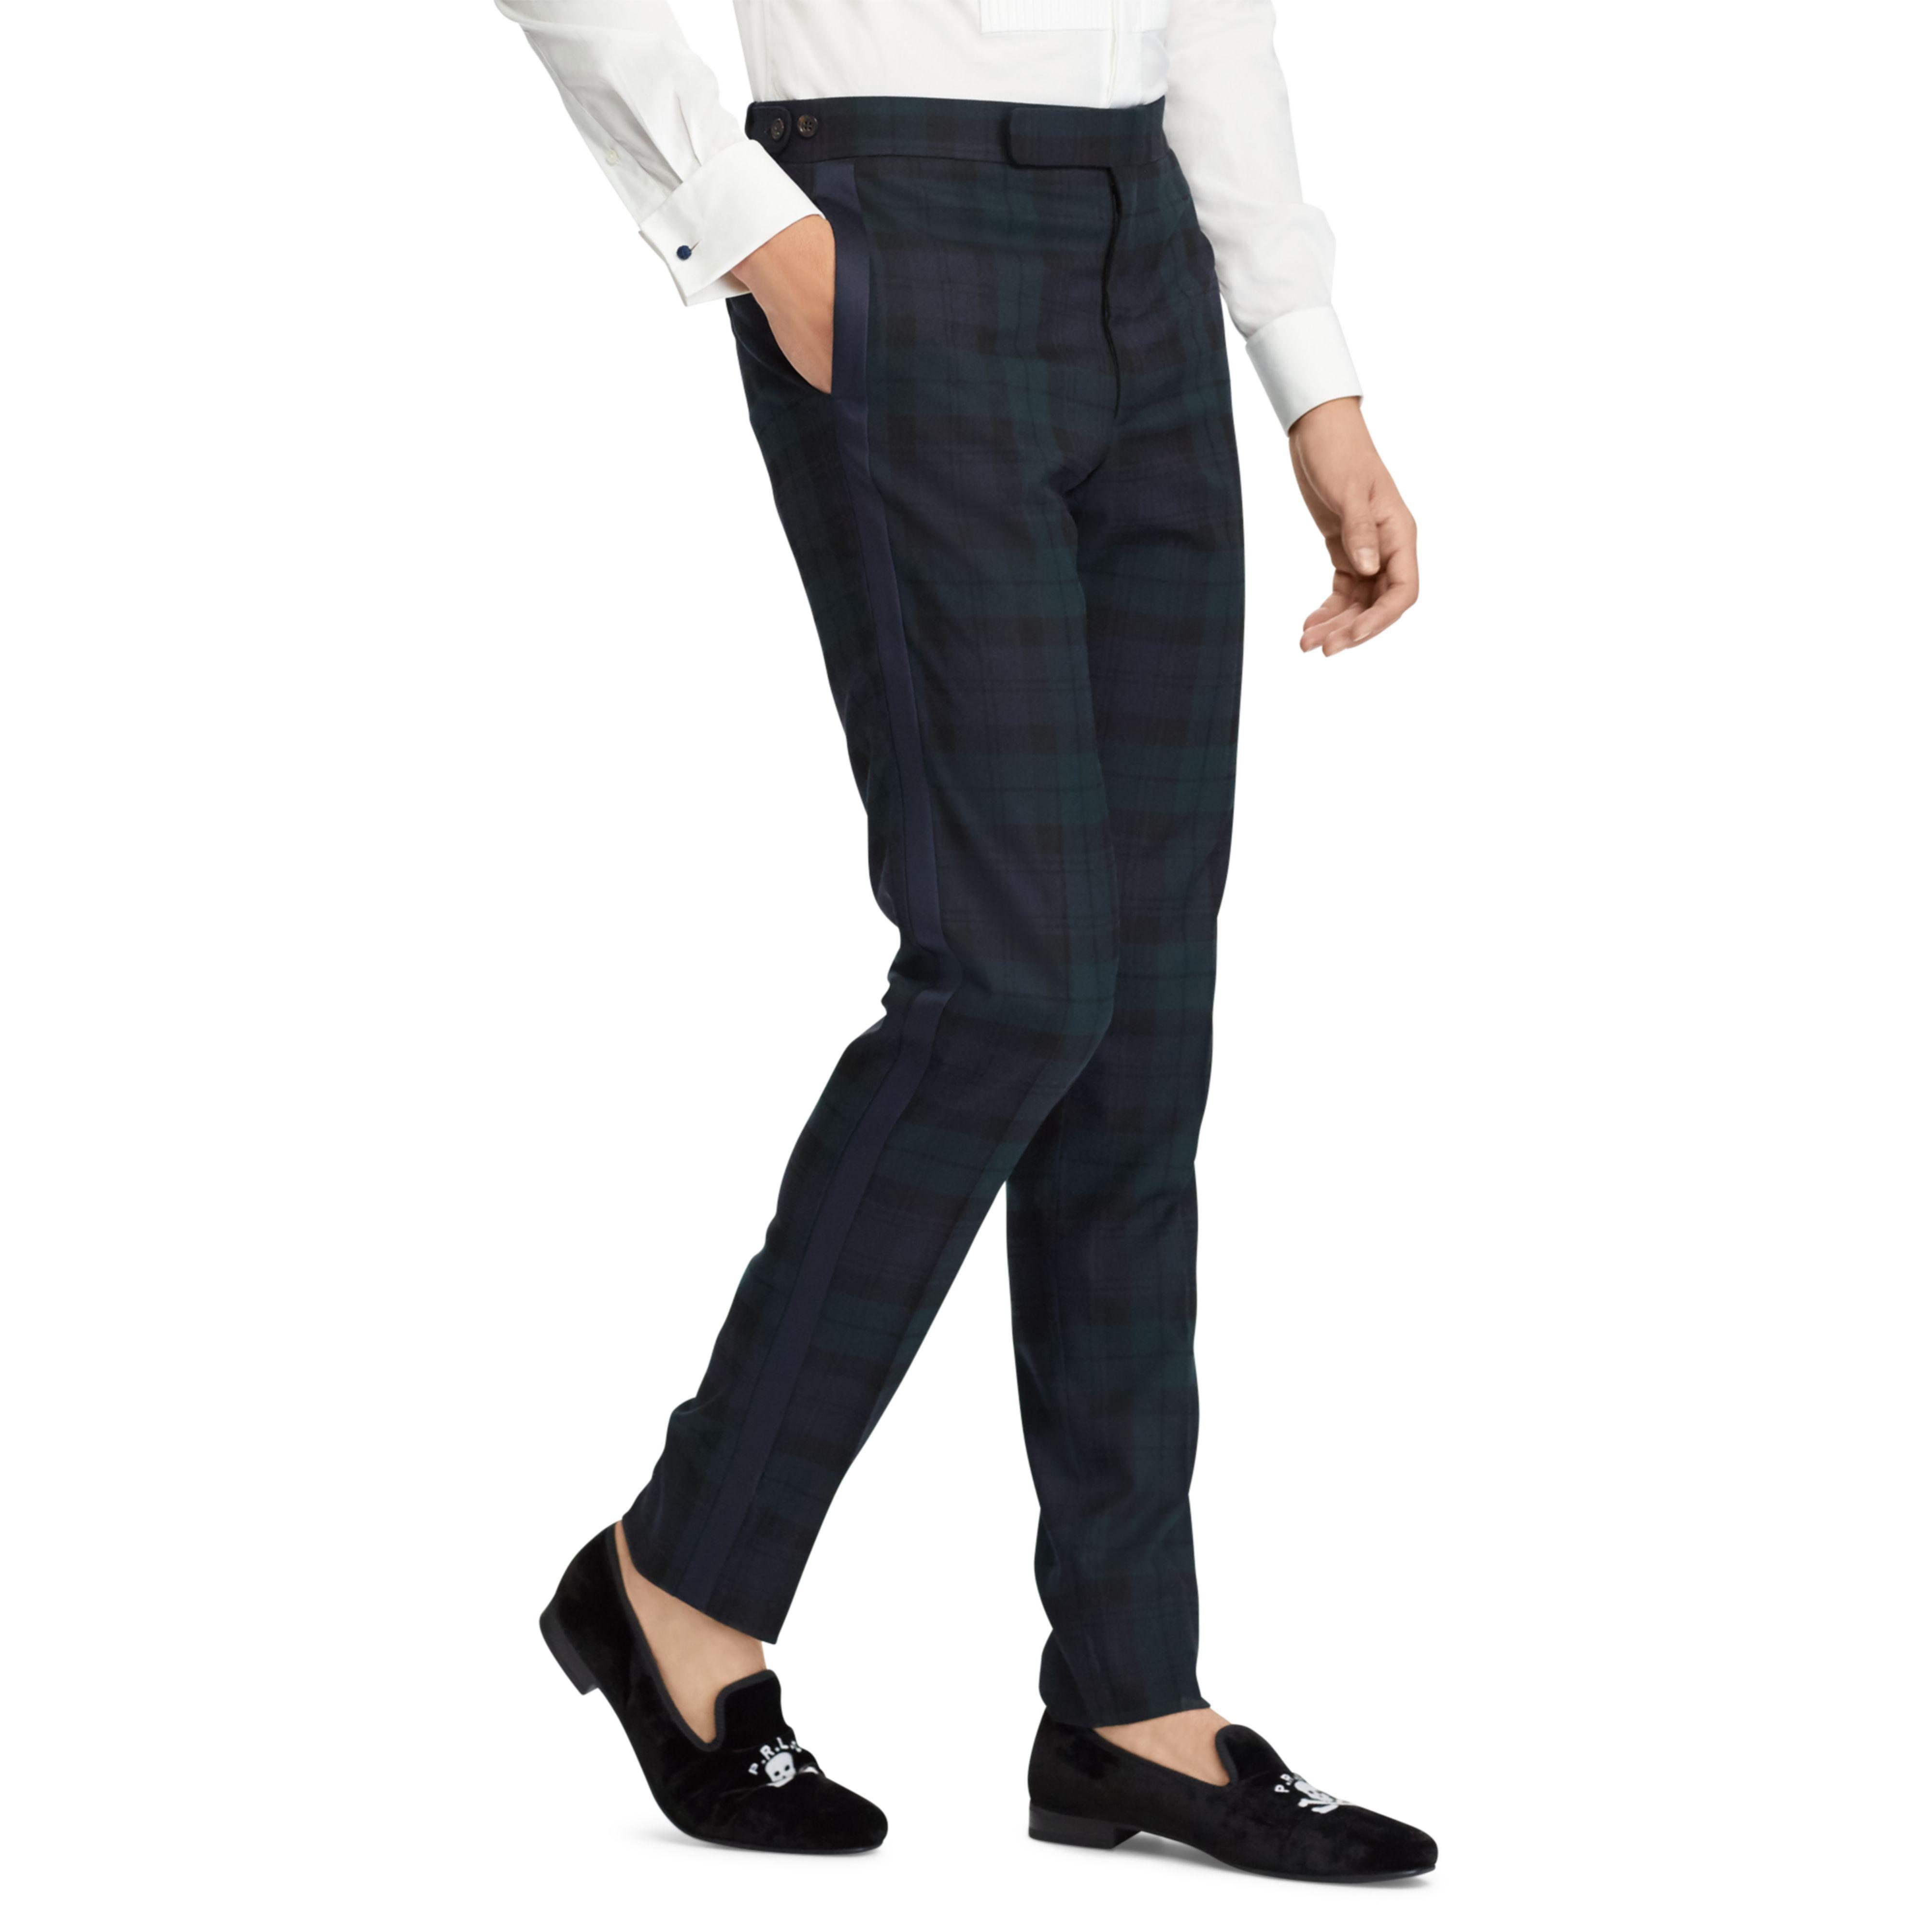 b1c48144c02 Lyst - Polo Ralph Lauren Tartan Tuxedo Trouser in Blue for Men